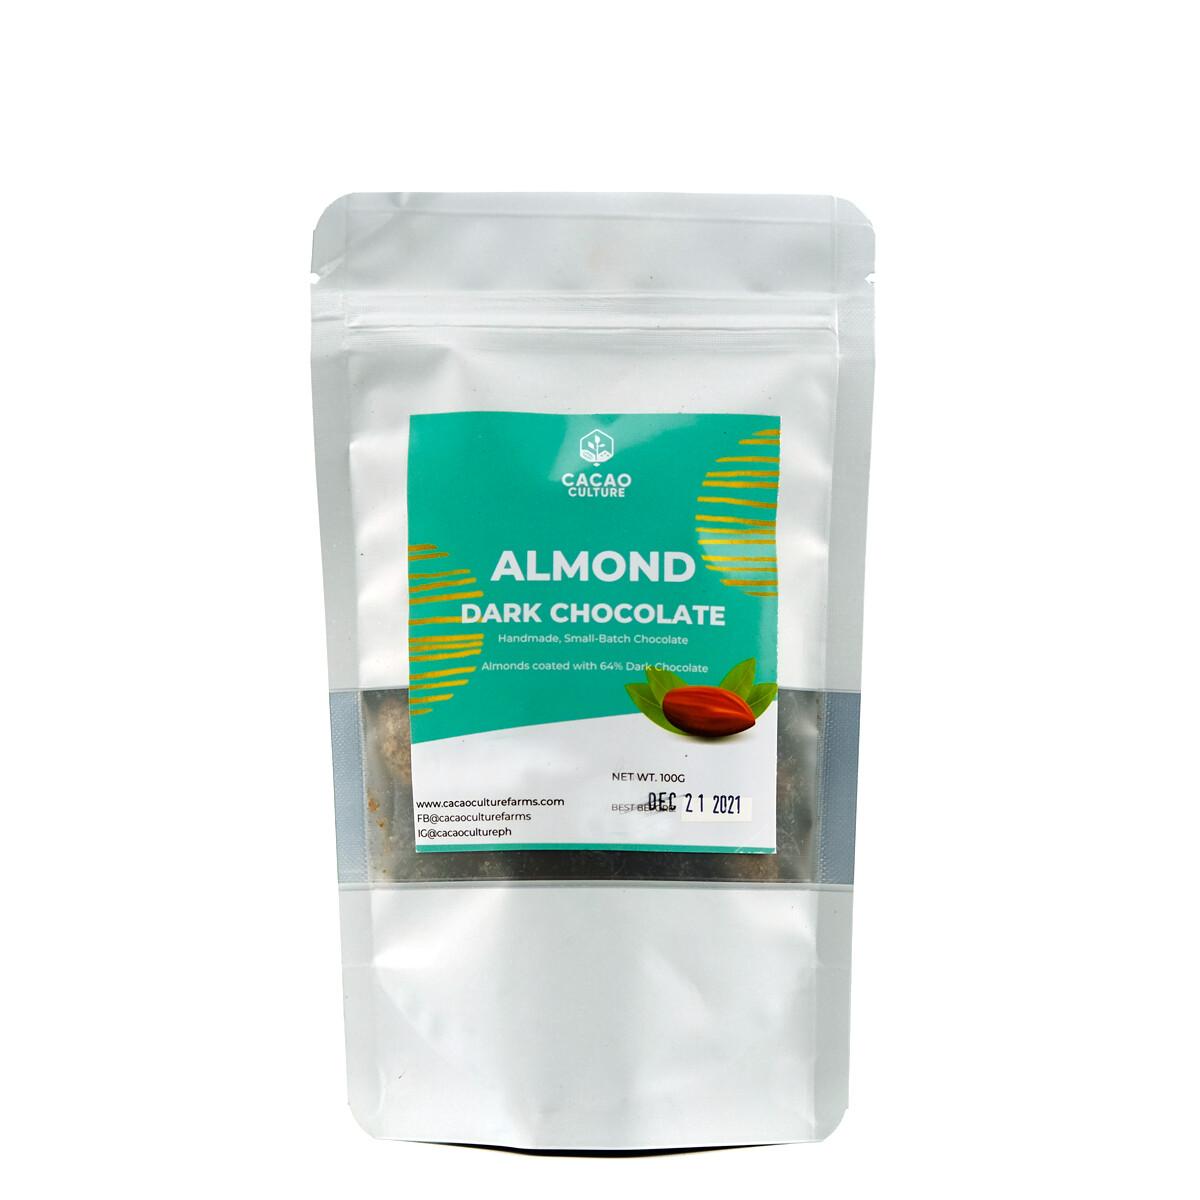 Cacao Culture Almond Dark Chocolate